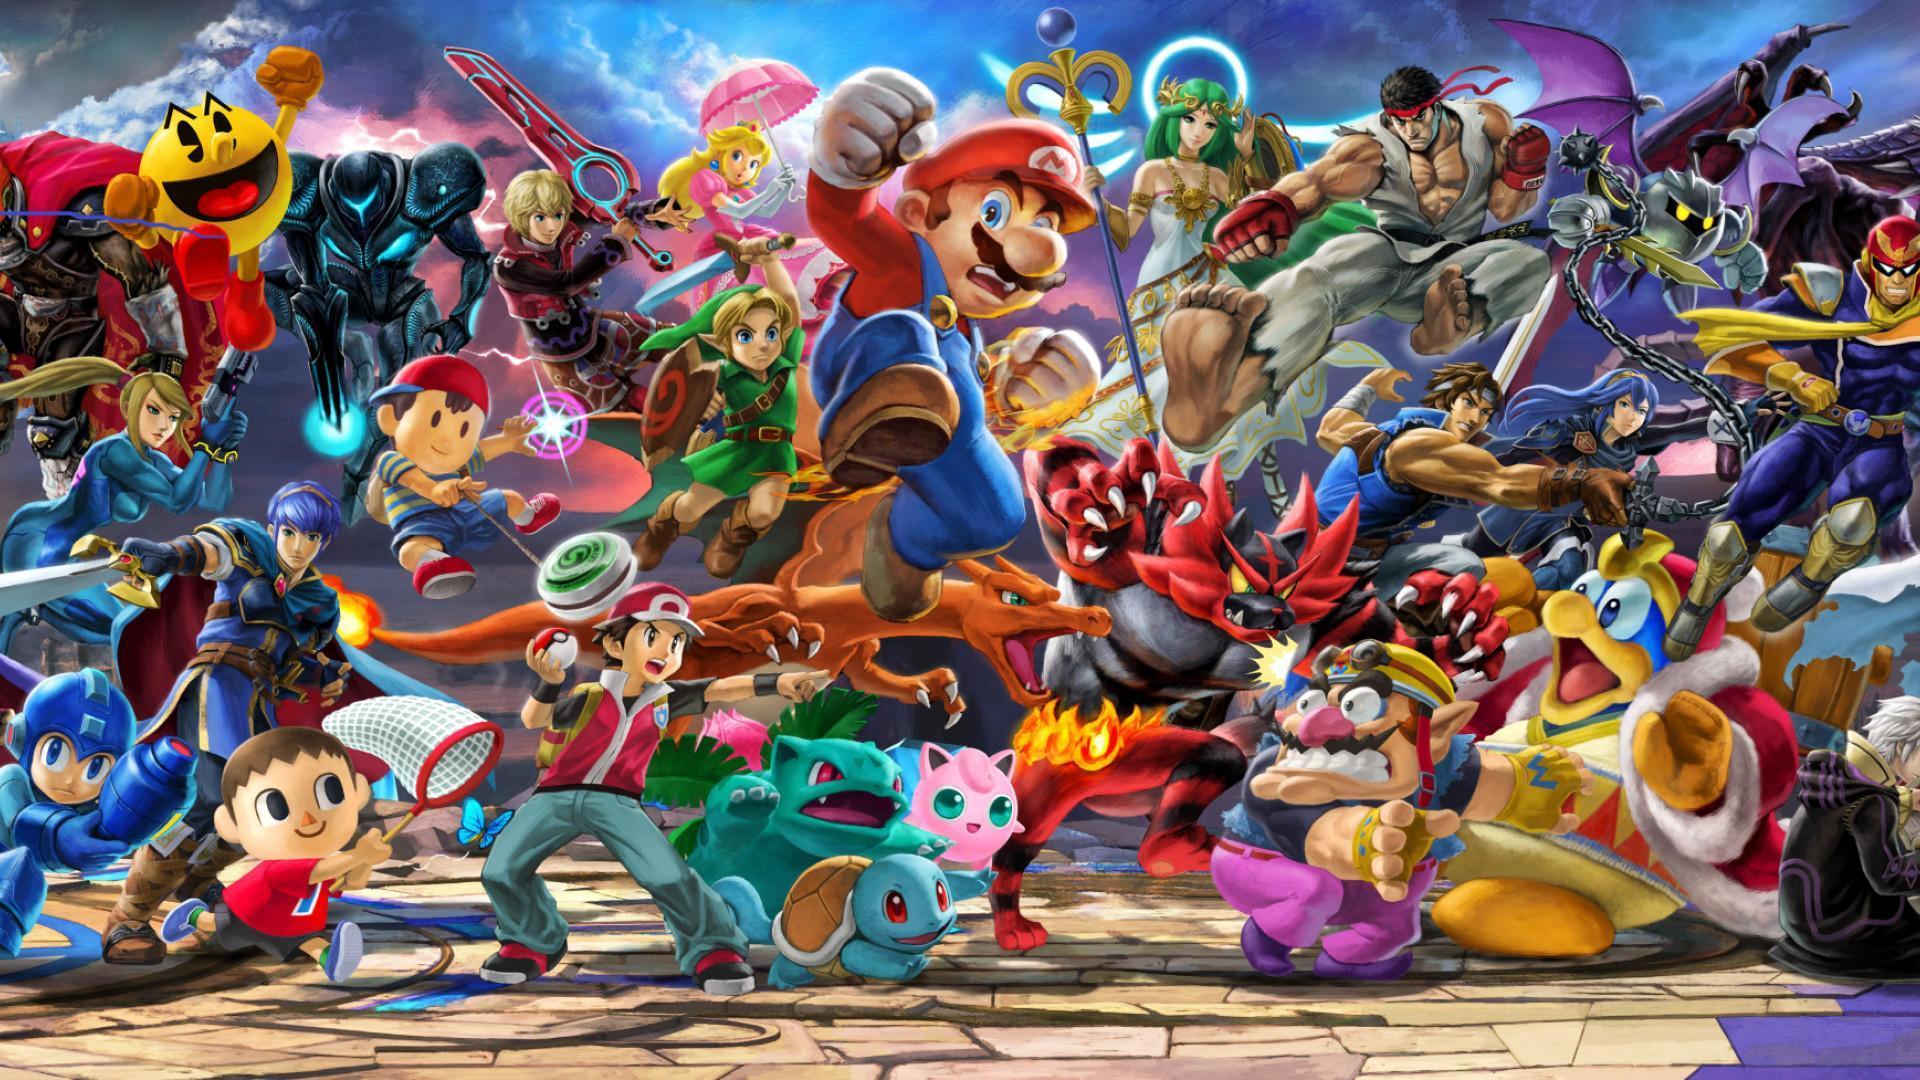 Super Smash Bros Ultimate Wallpapers Top Free Super Smash Bros